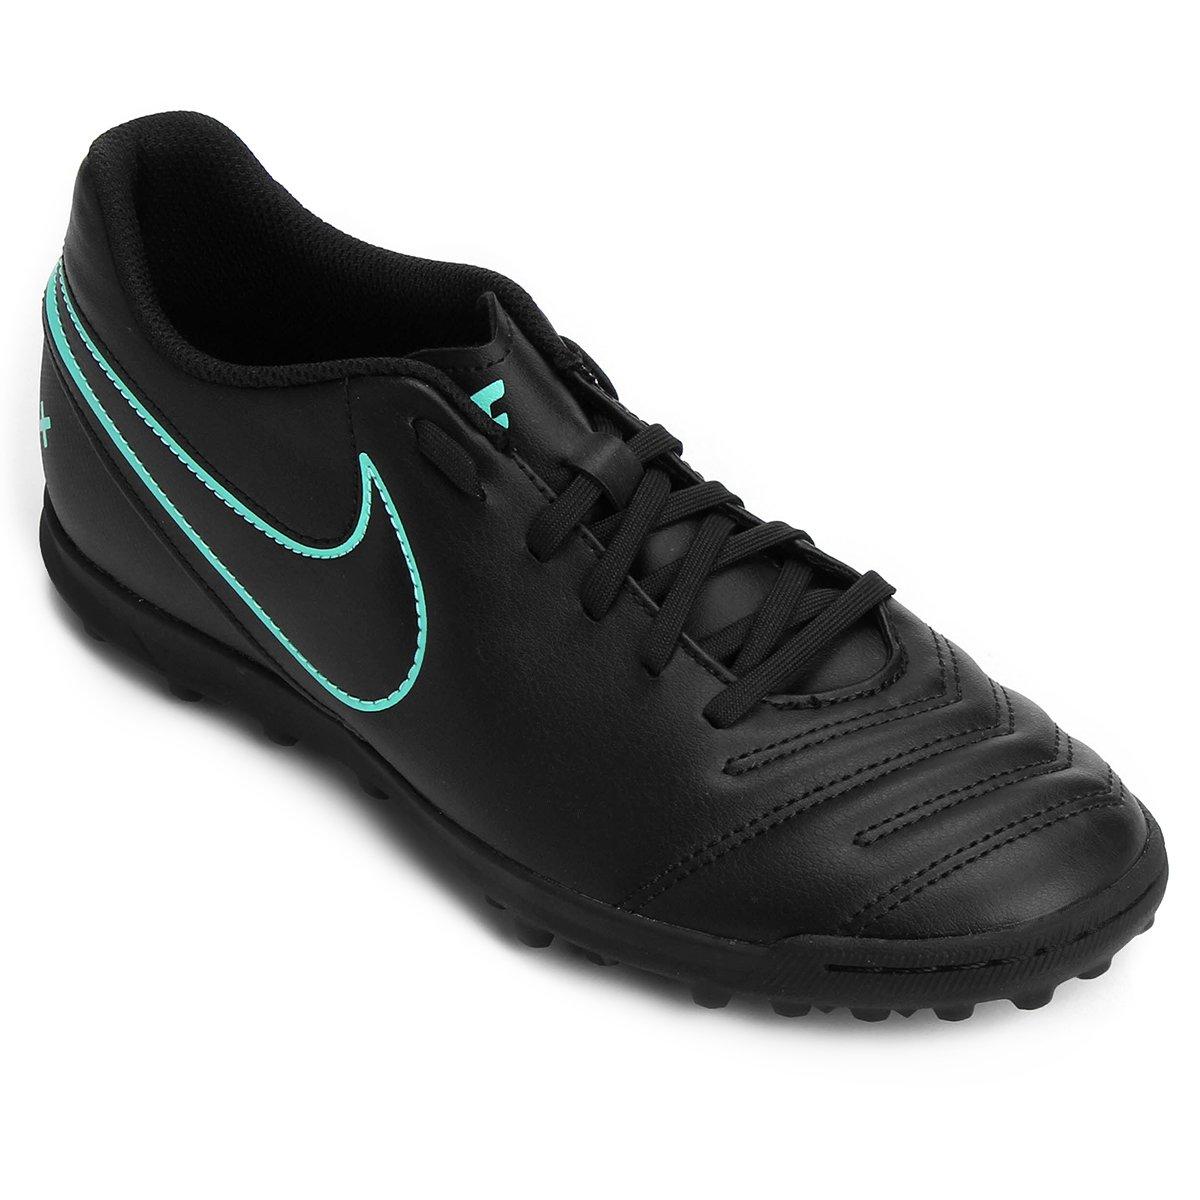 Chuteira Society Nike Tiempo Rio 3 TF - Preto